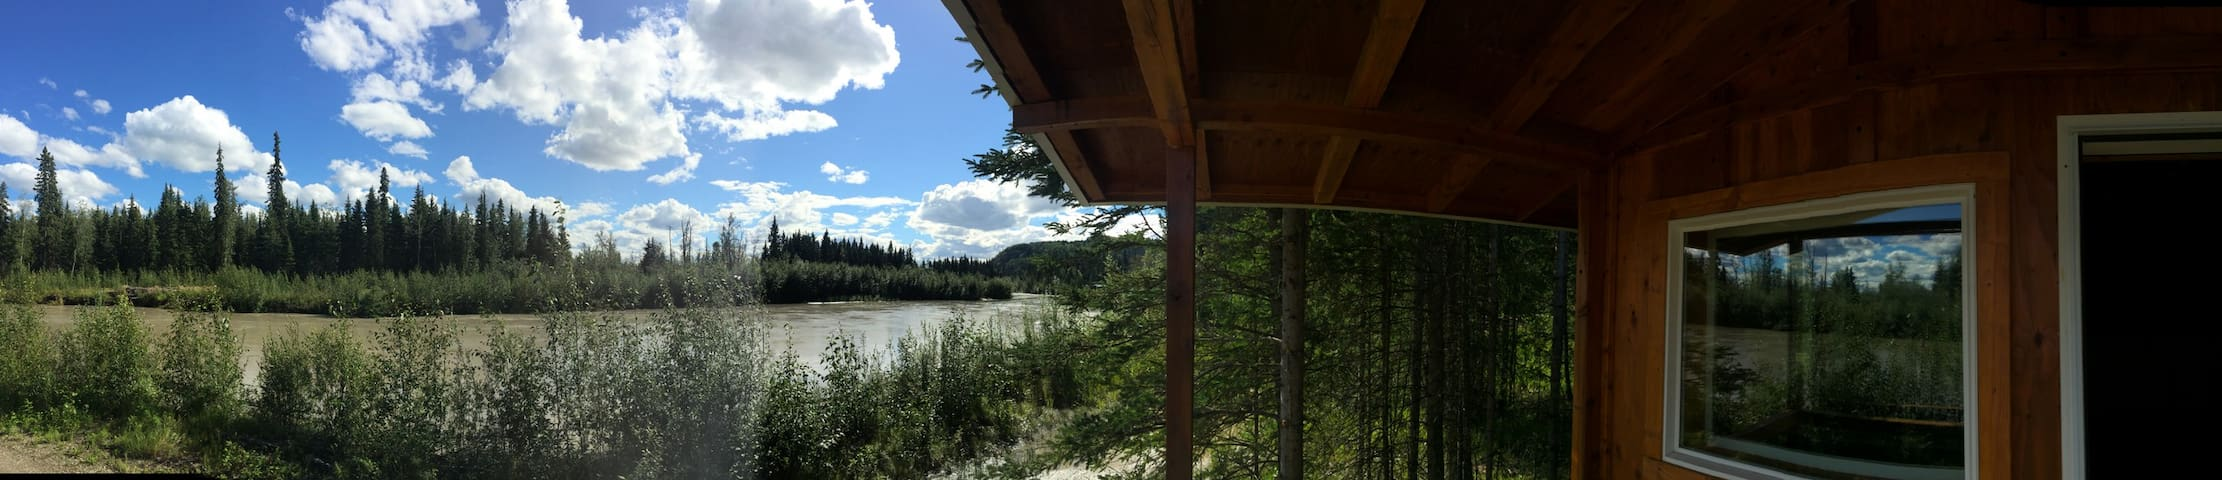 Meandering Moose #18 Waterfront, Borealis Views